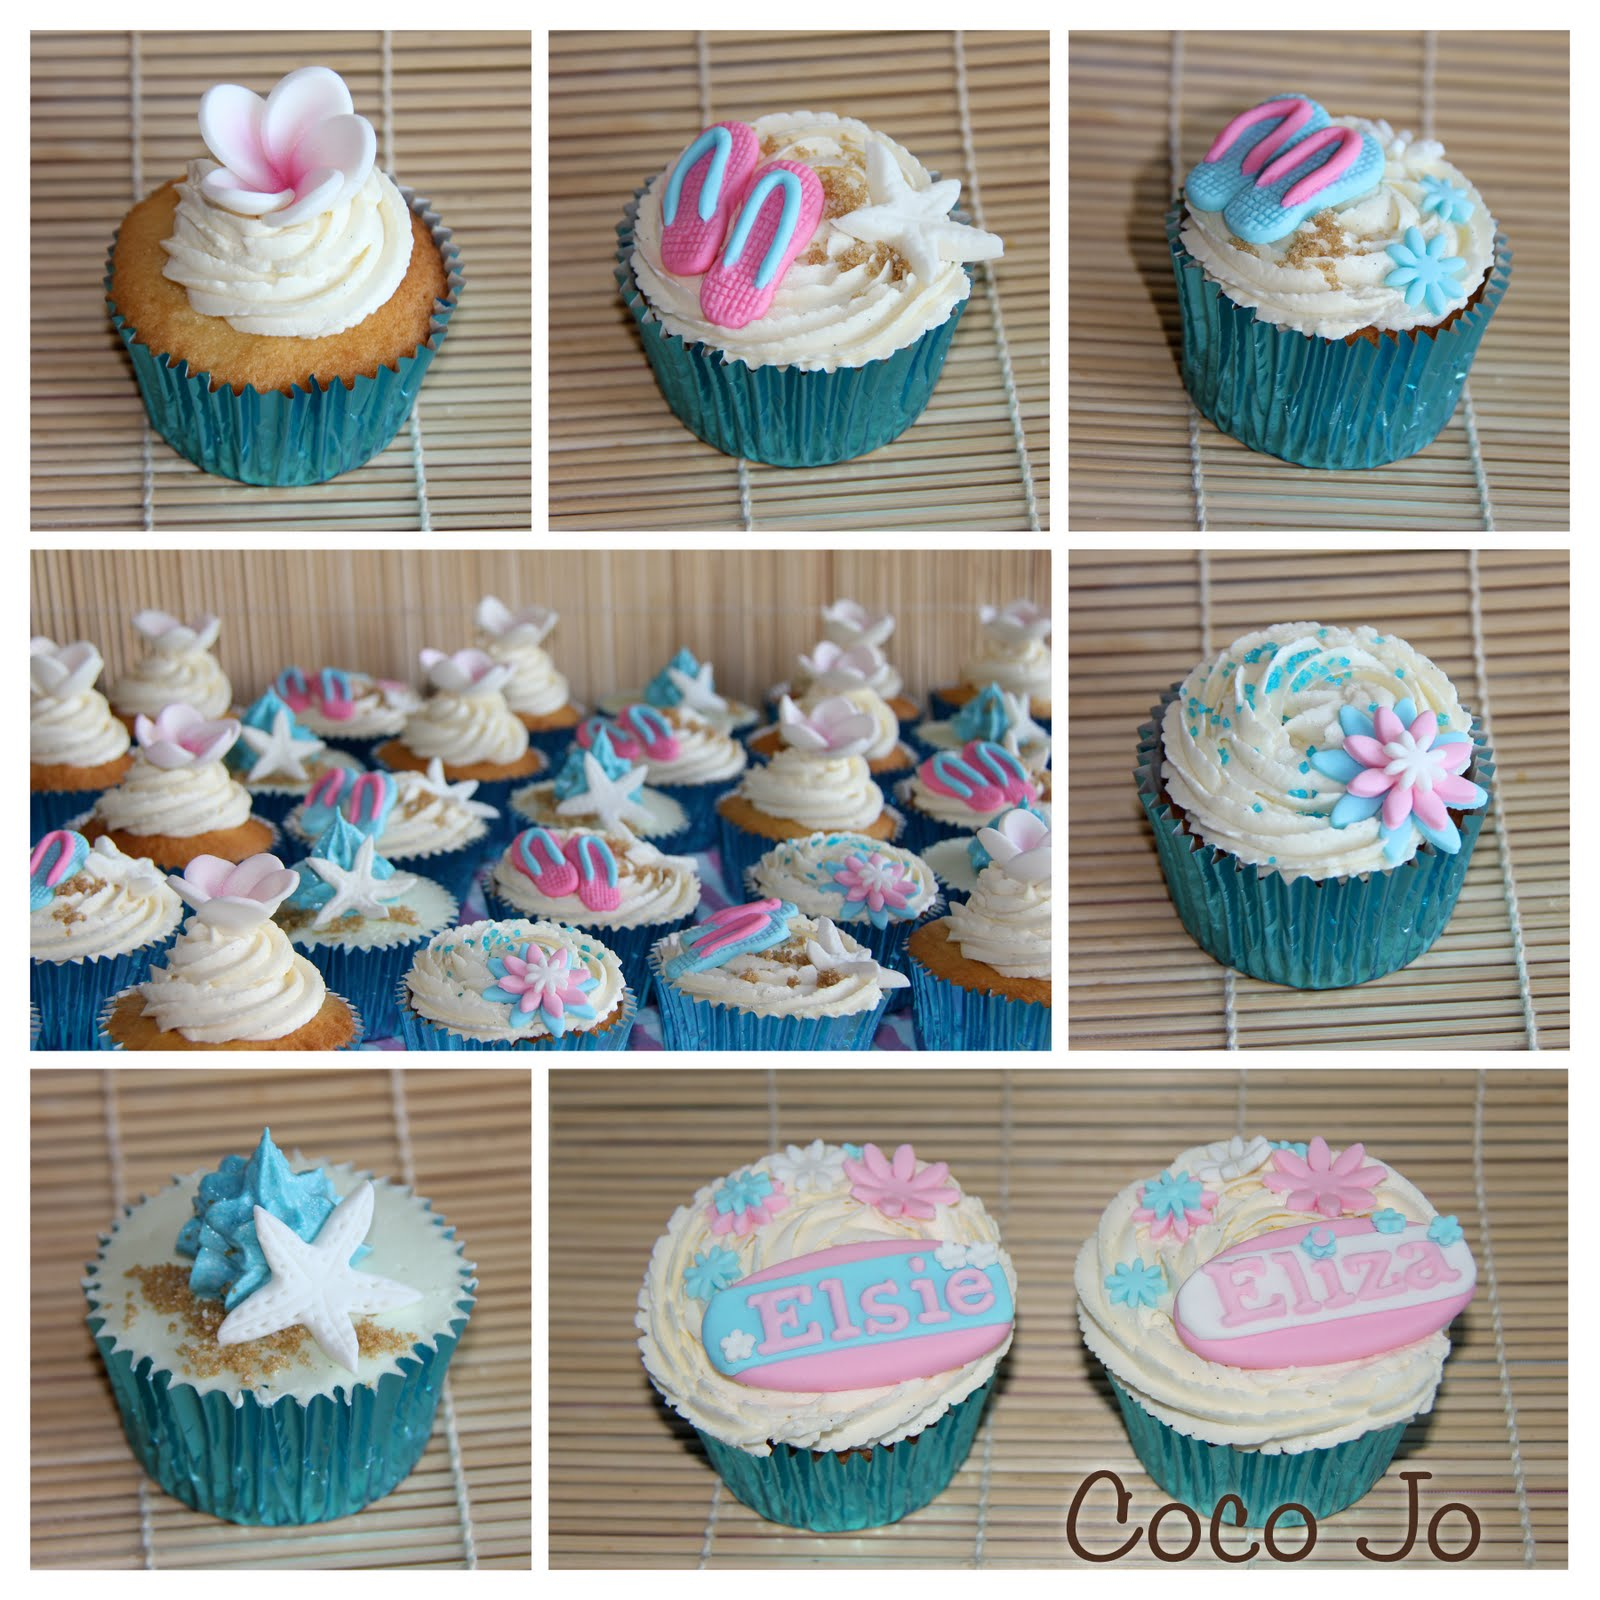 50th Anniversary Cupcake Decorations 50th Wedding Anniversary Cupcake Picks Th Wedding Anniversary